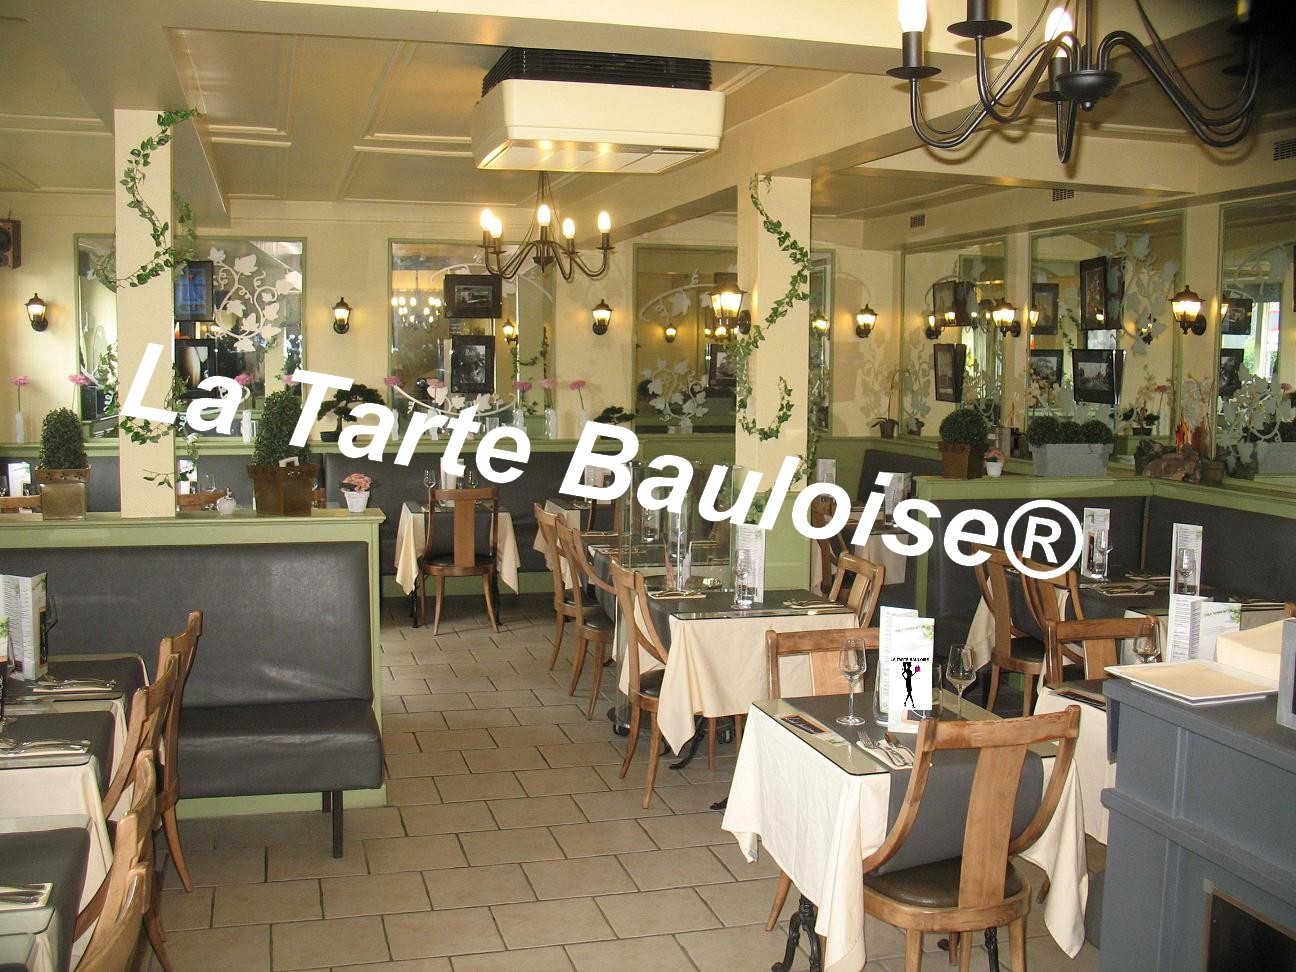 la_tarte_bauloise_kisskissbankbank_licence-1415438881.jpg